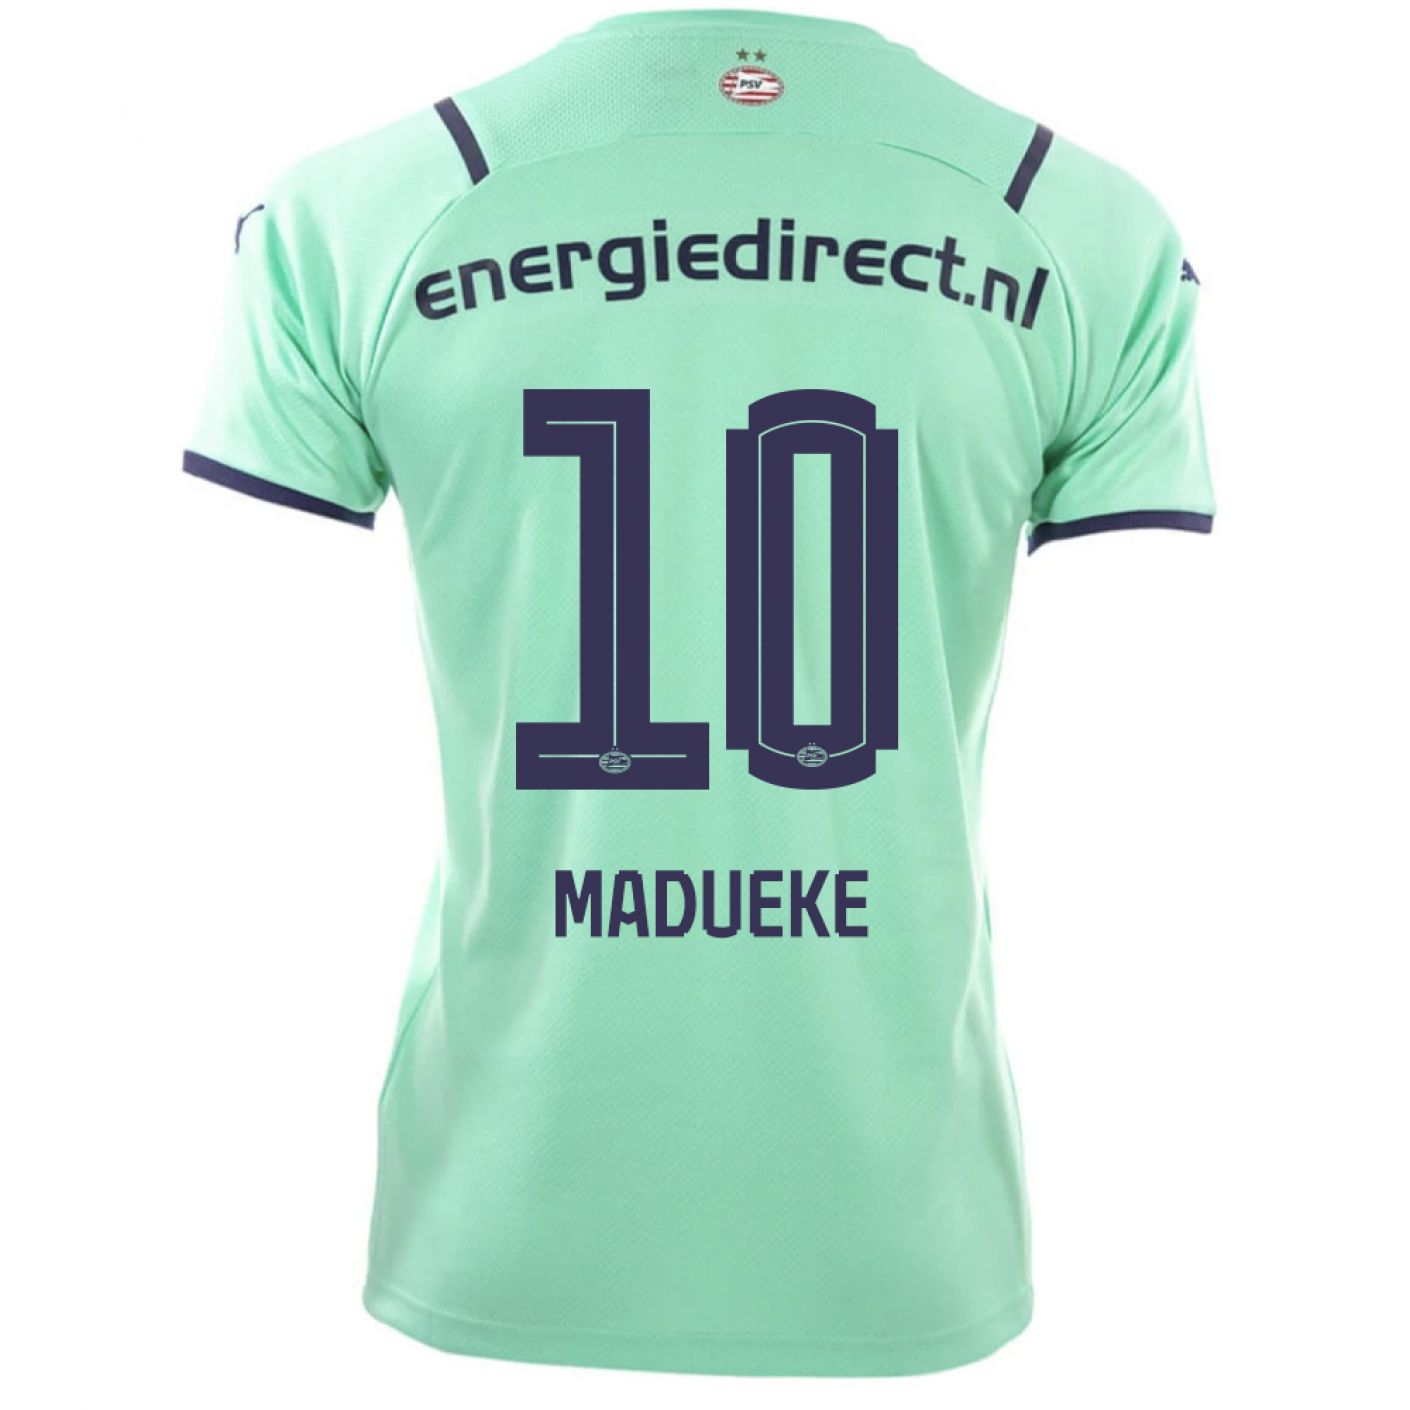 PSV Madueke 10 Derde Shirt Authentic 21/22